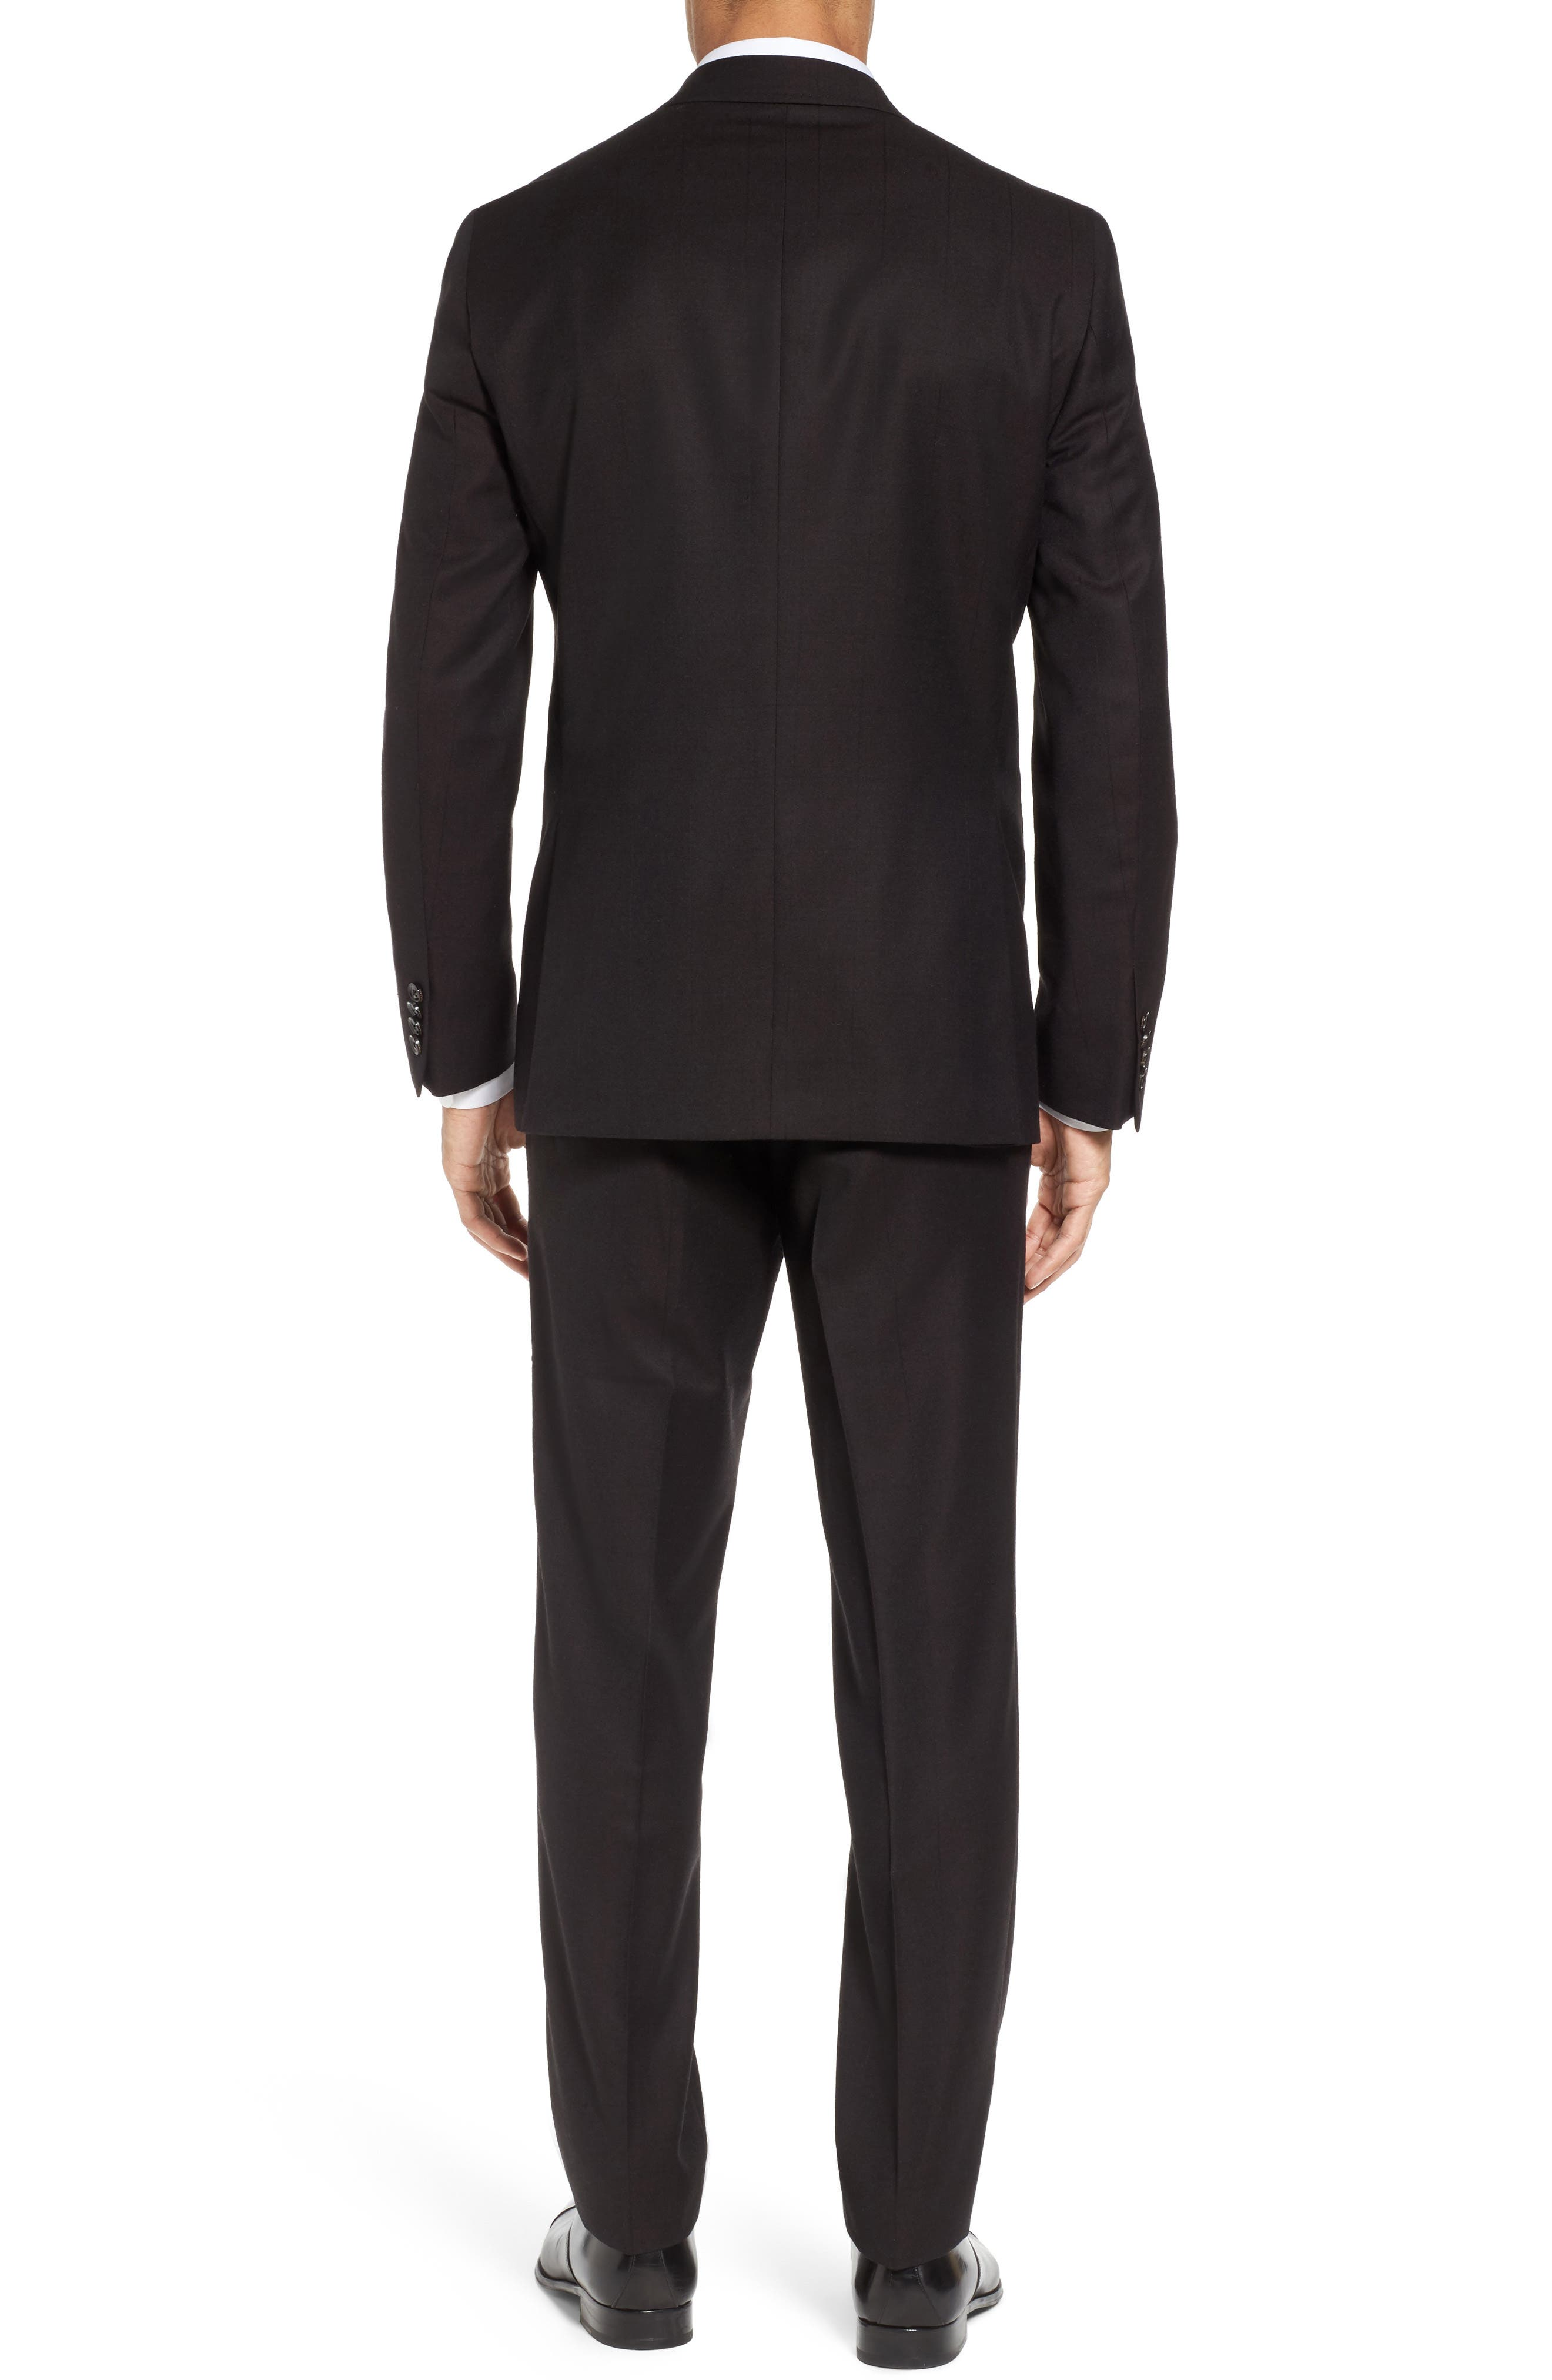 Jay Trim Fit Solid Wool Suit,                             Alternate thumbnail 2, color,                             200